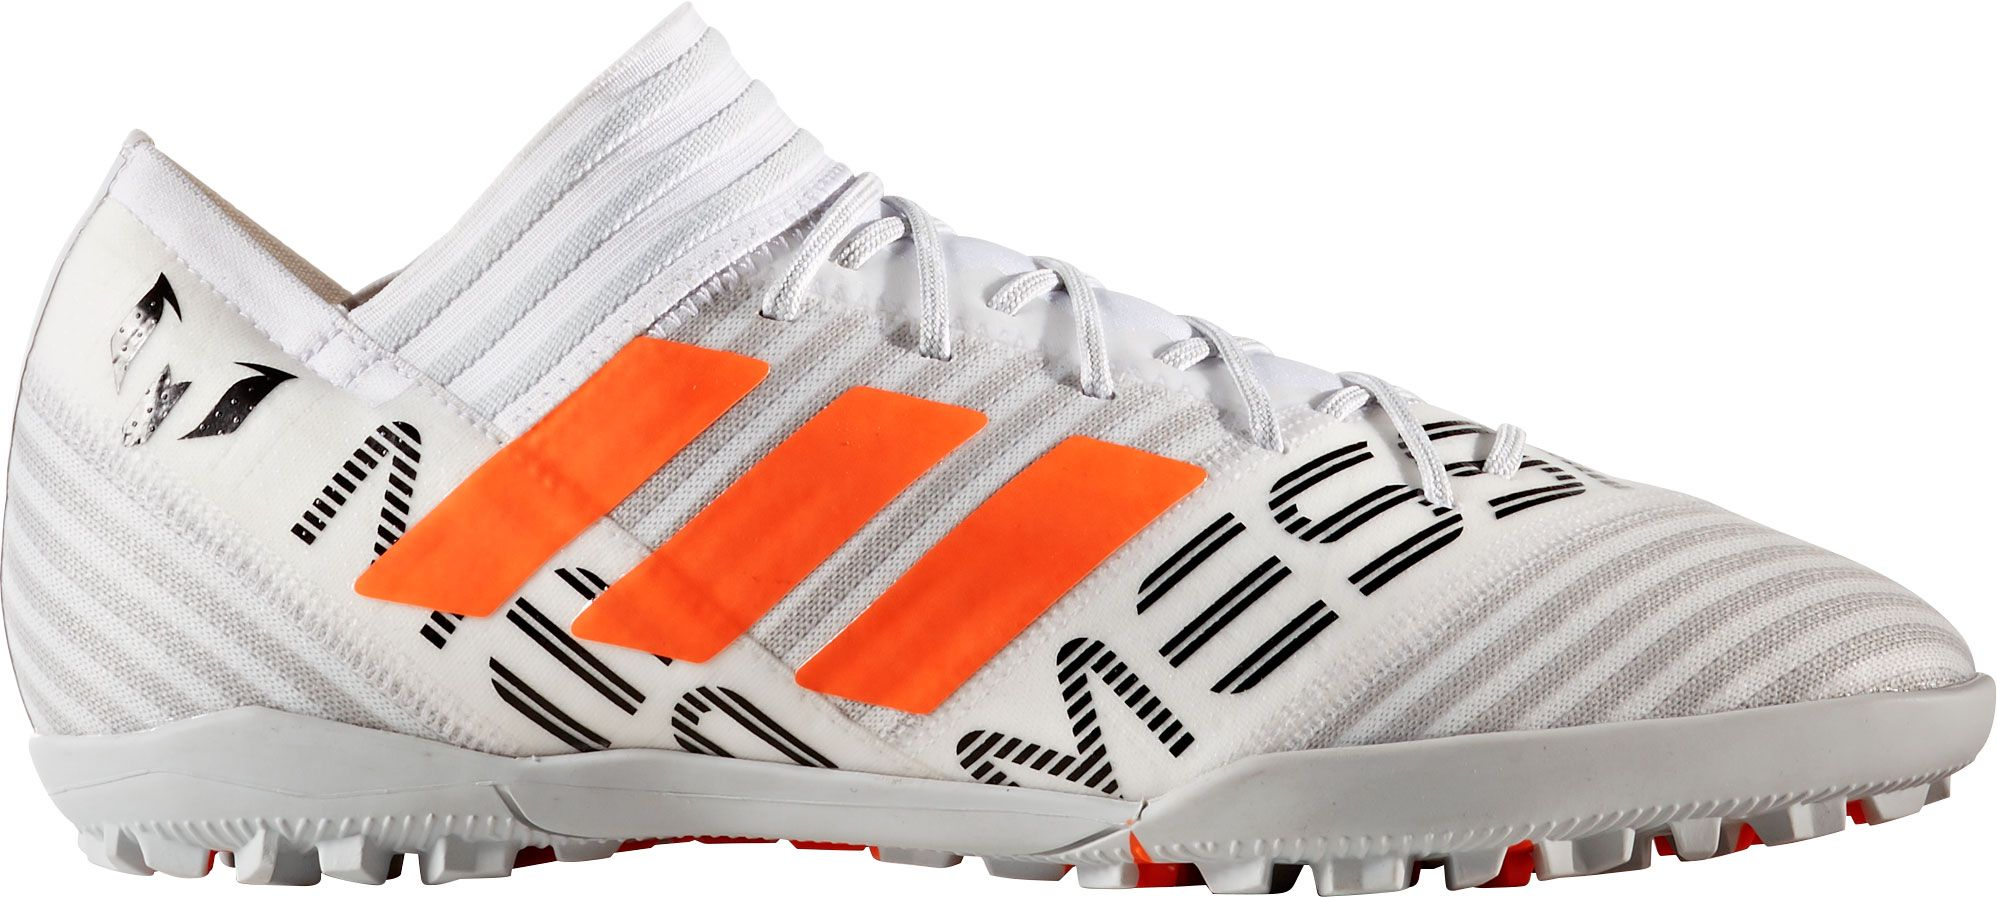 adidas Men's Nemeziz Messi Tango 17.3 Turf Soccer Cleats | DICK'S Sporting  Goods